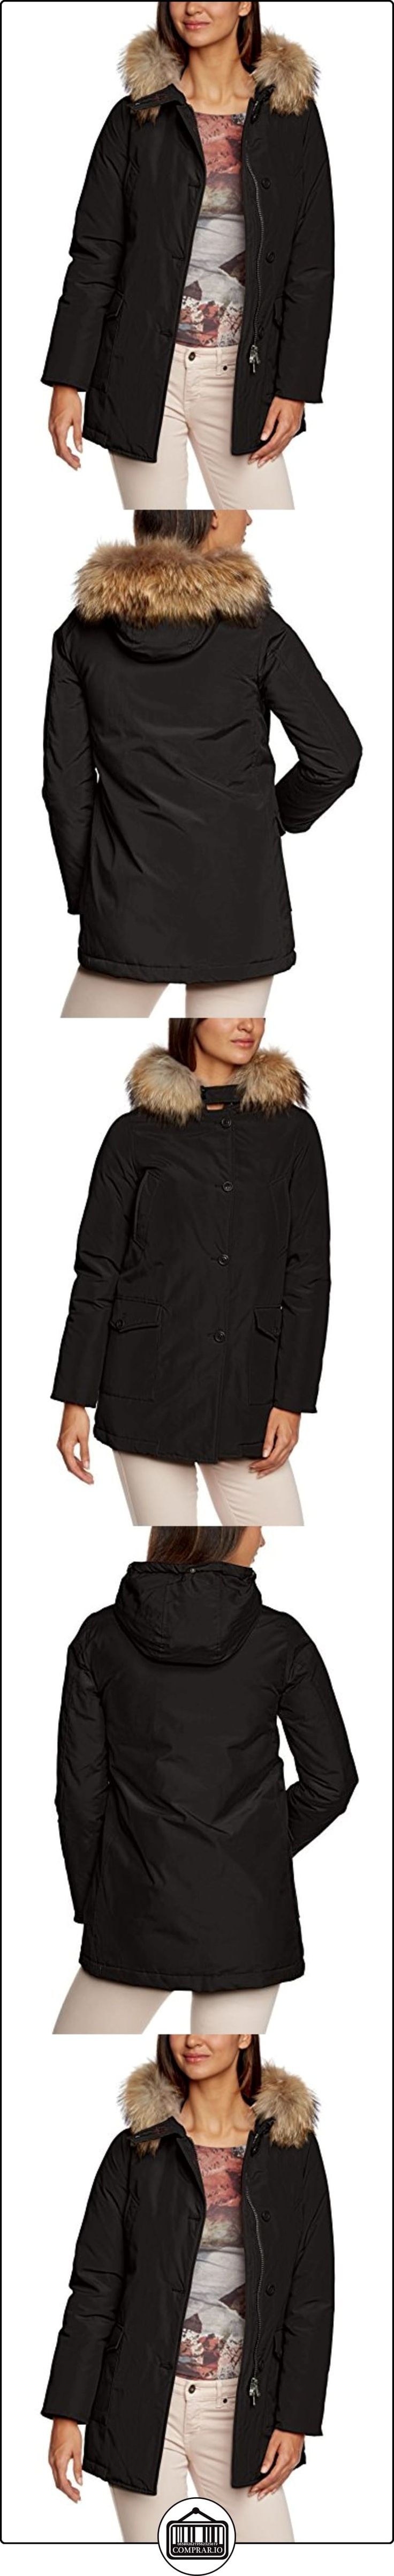 Canadian Classics - Chaqueta parka de manga larga para mujer, color negro, talla 44  ✿ Abrigos y chaquetas ✿